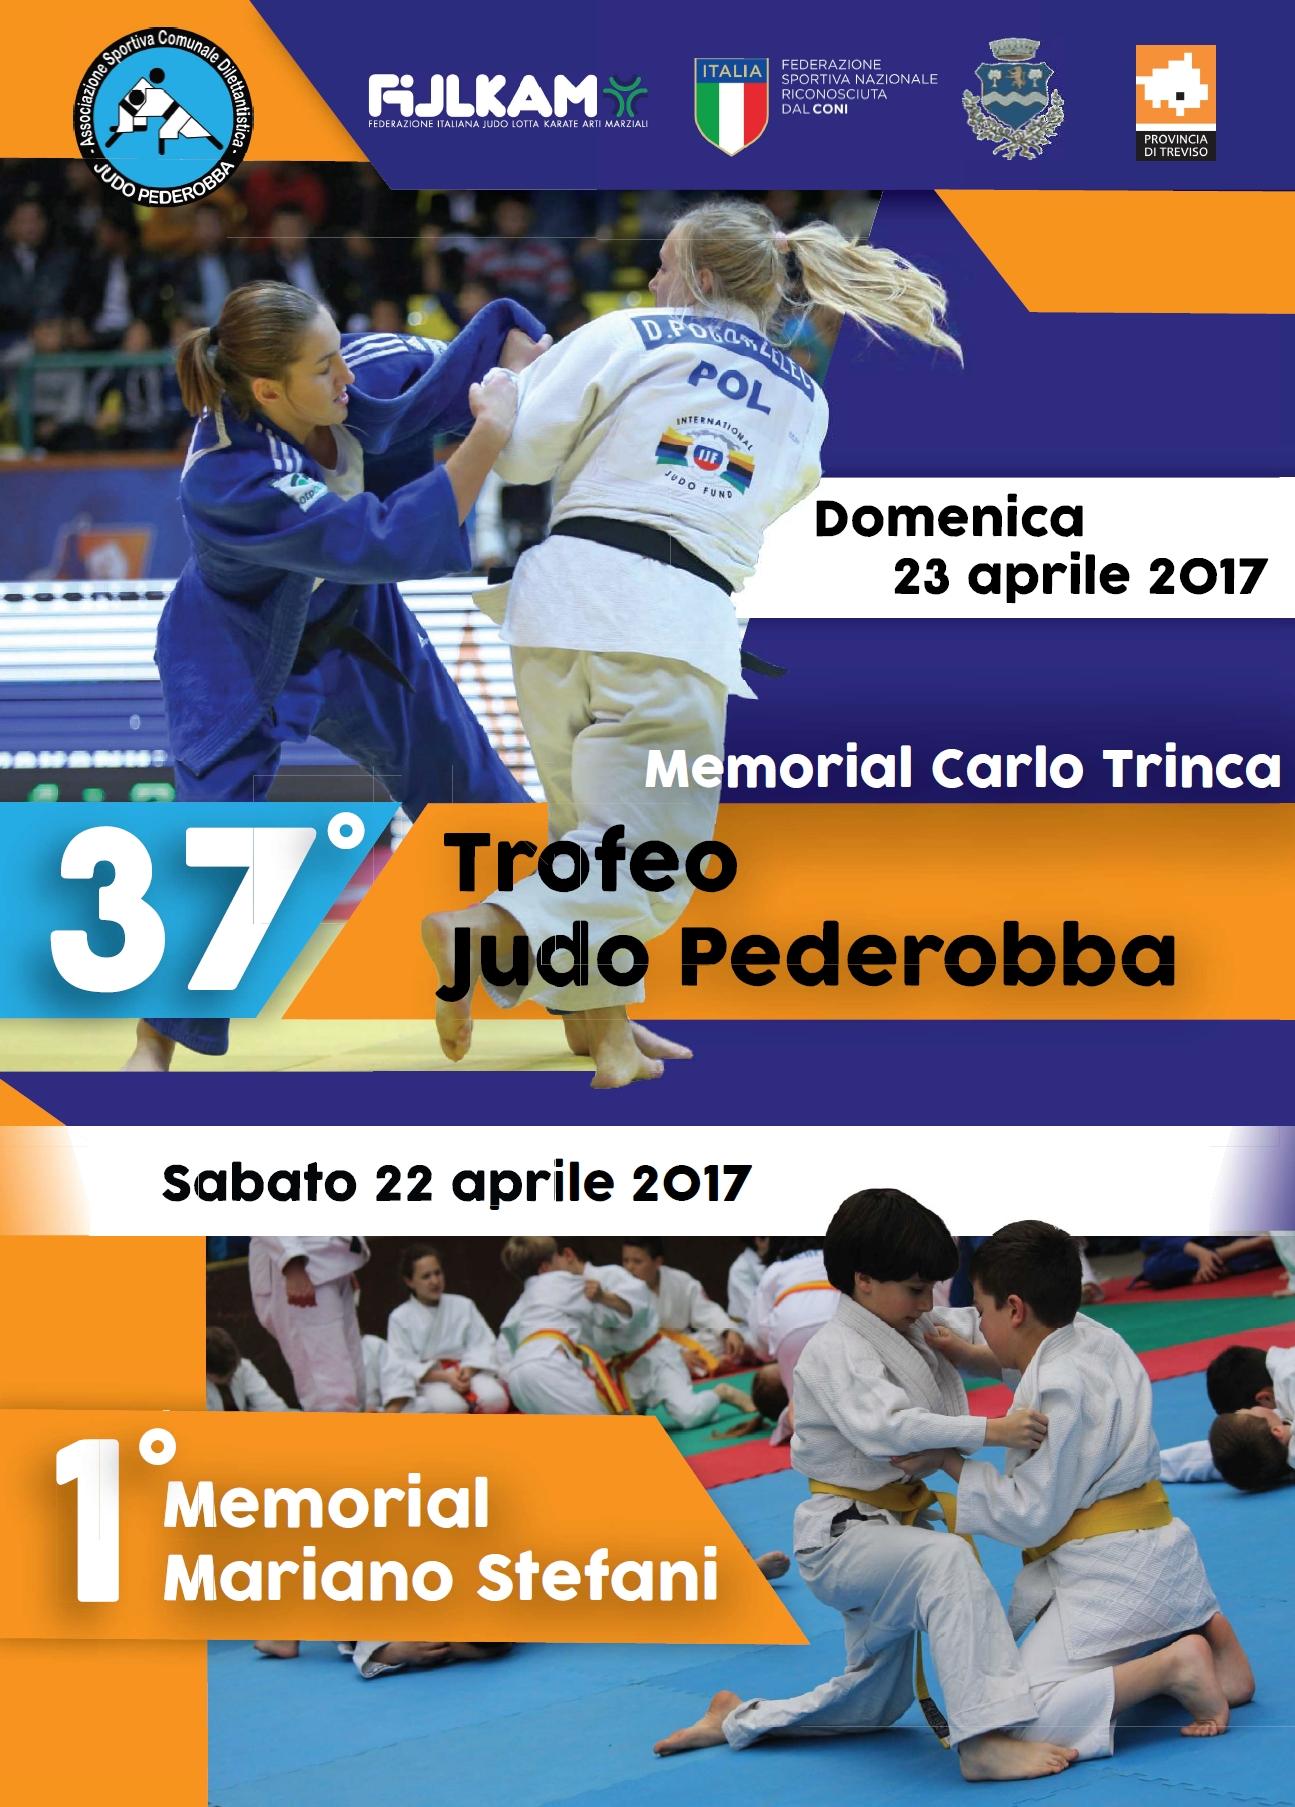 Trofeo Judo Pederobba 2017